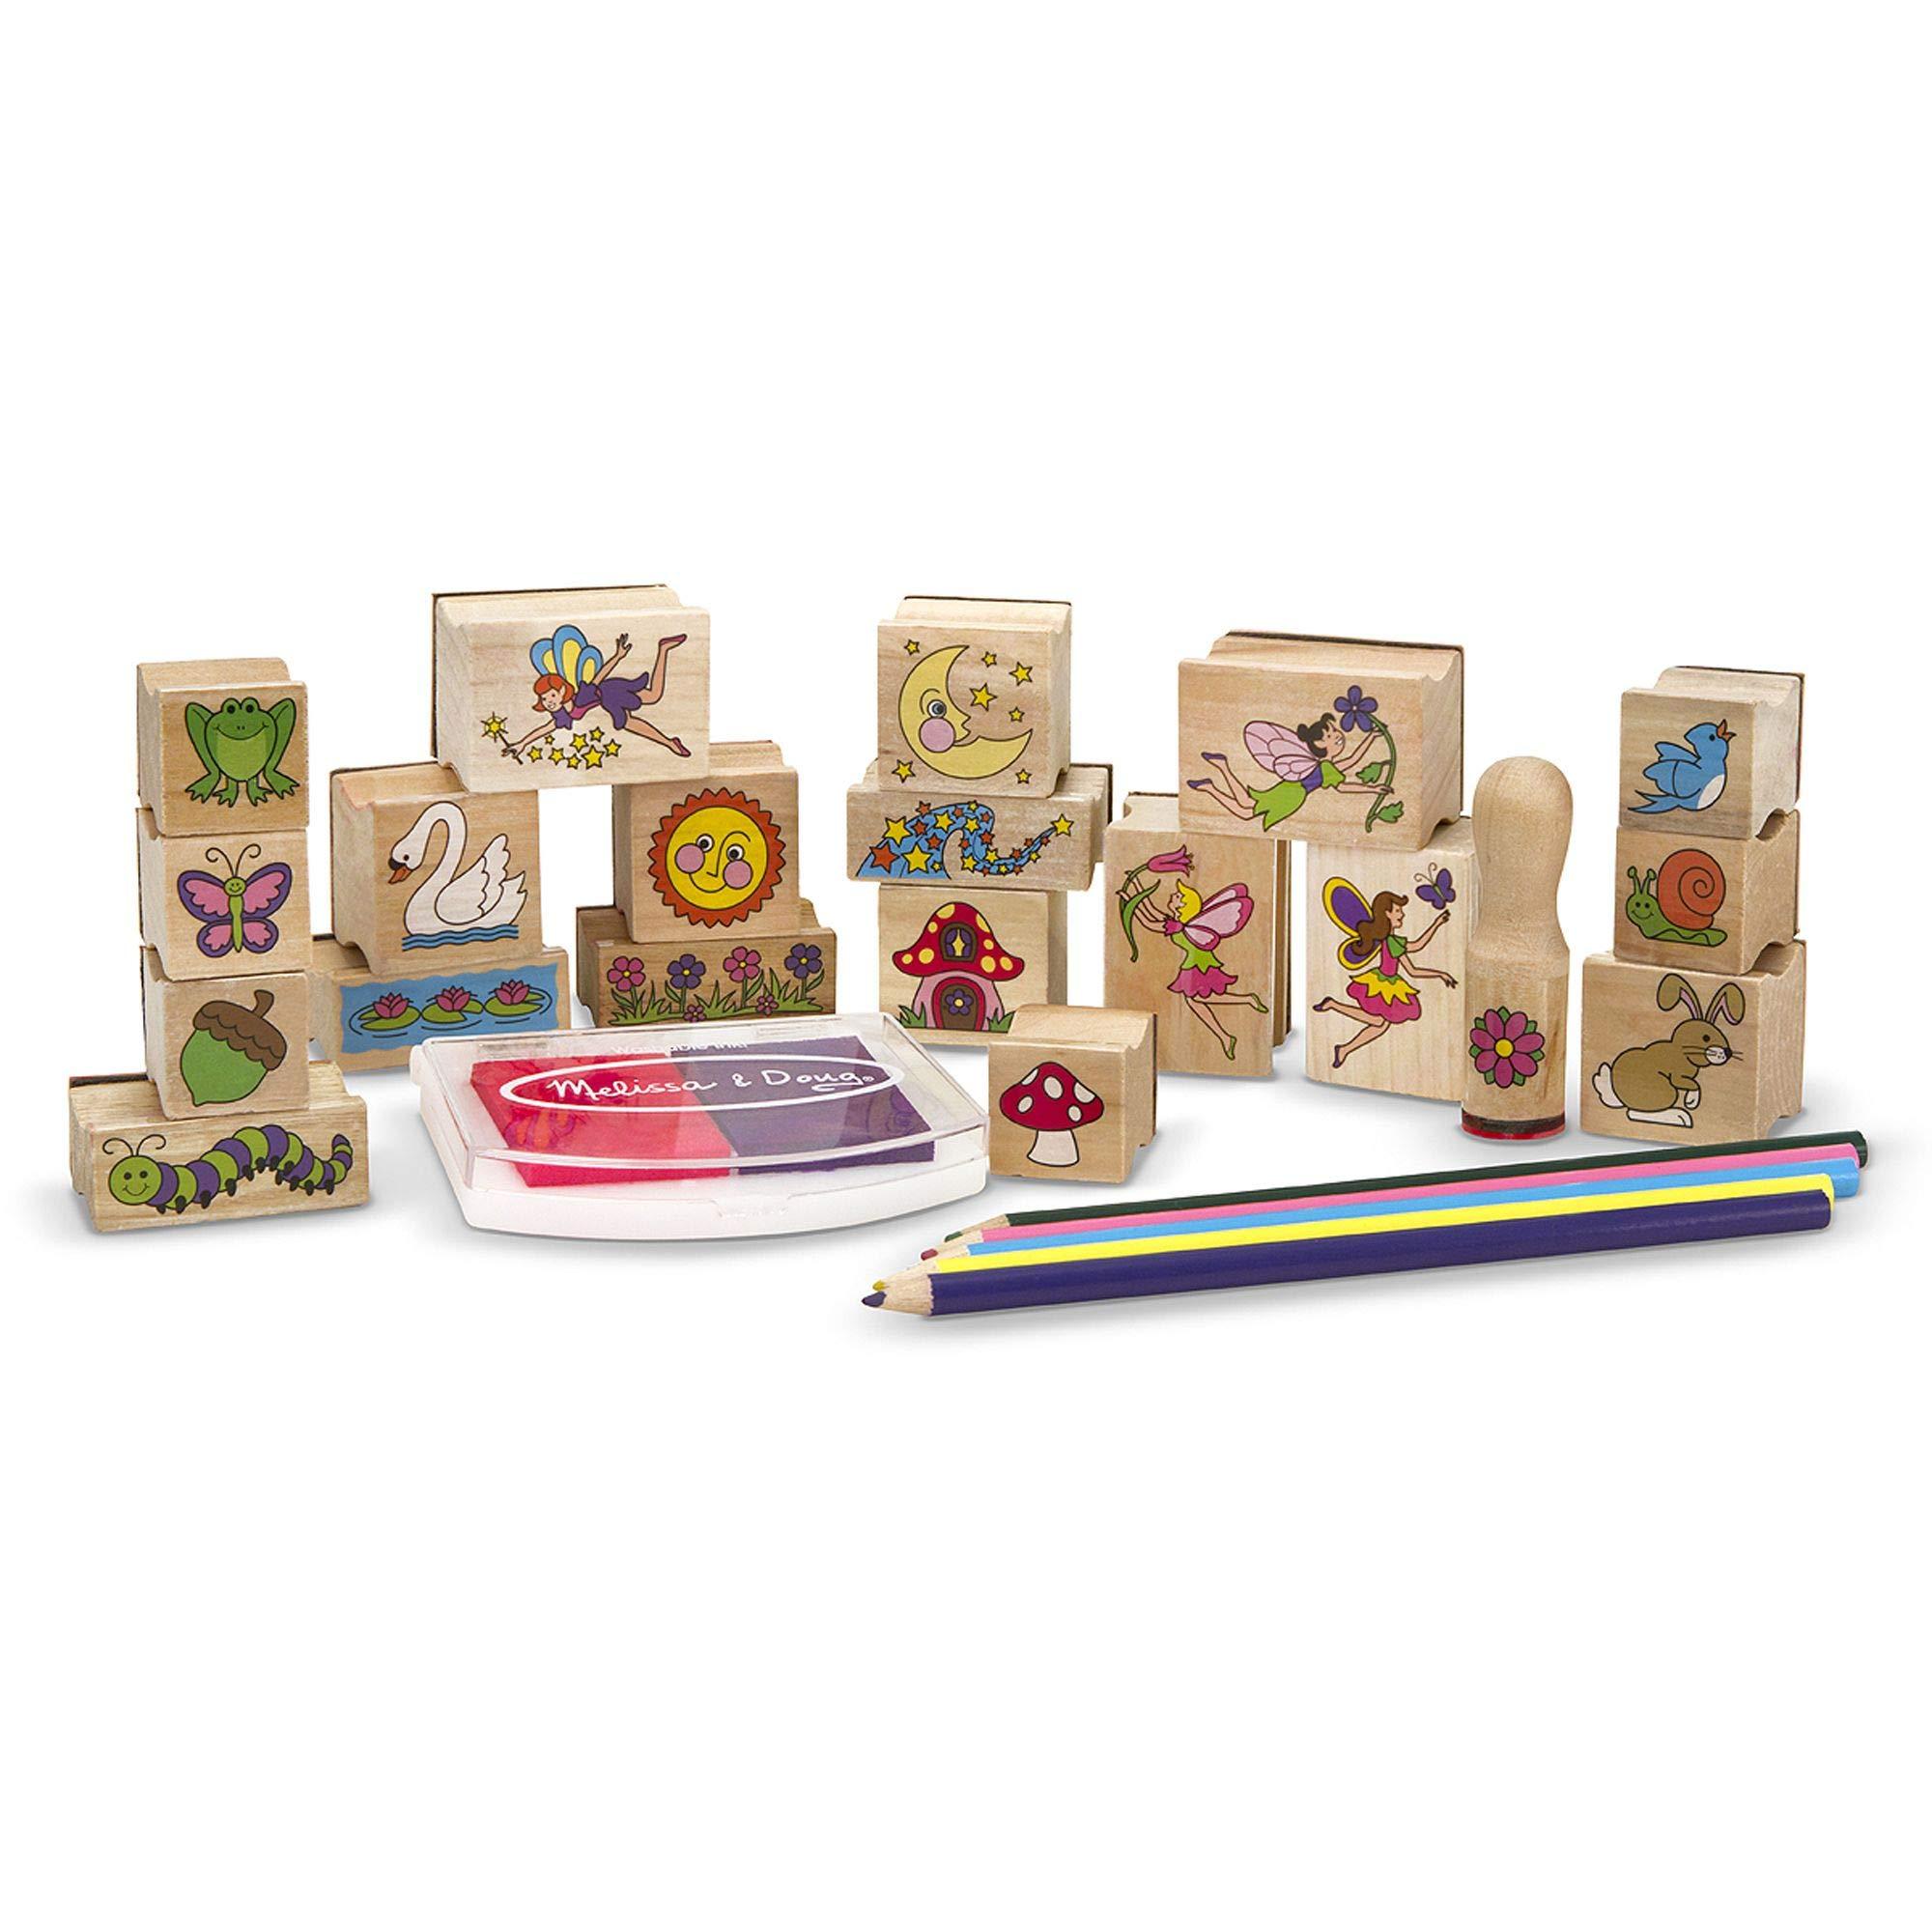 3 year old girl gifts amazon com rh amazon com